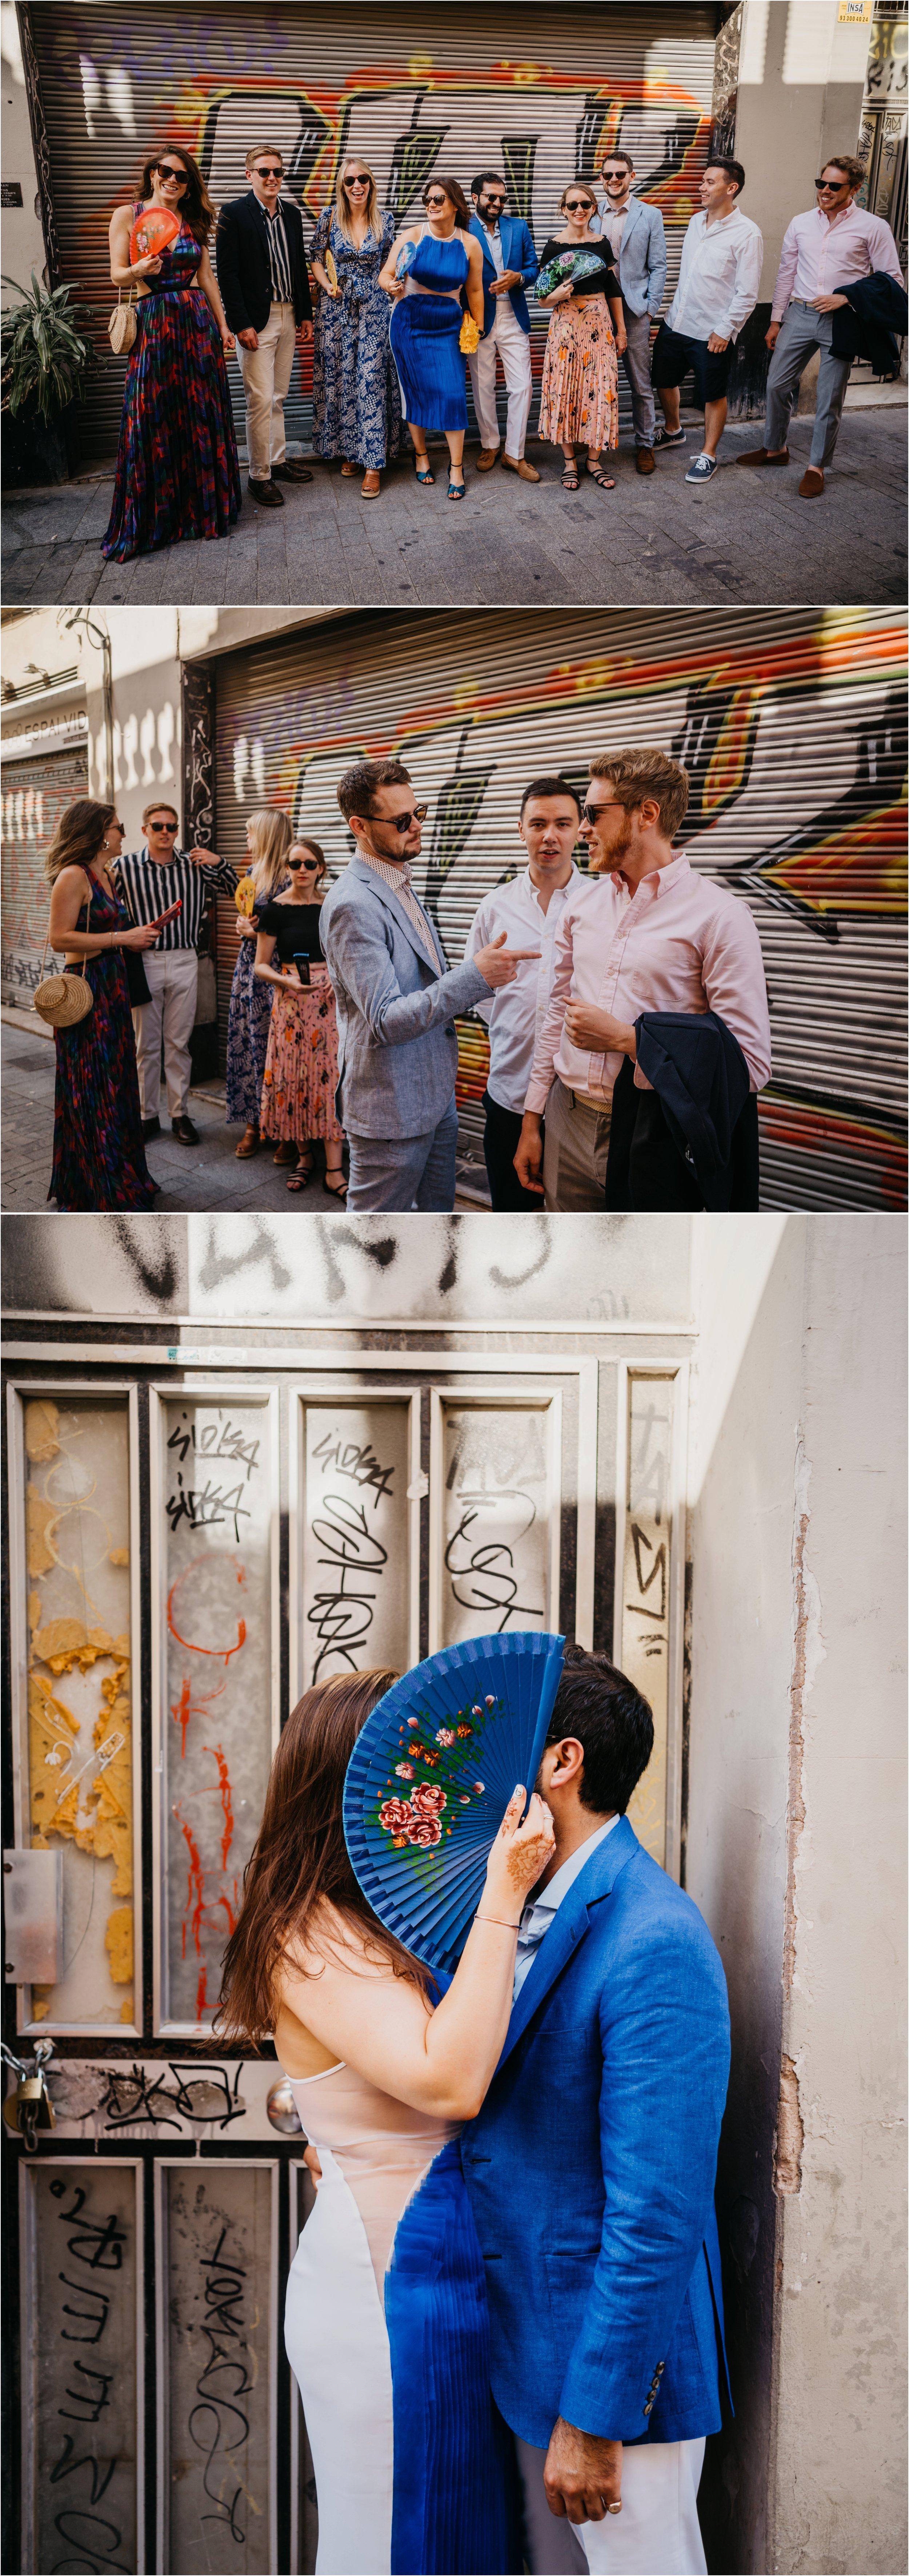 Barcelona Spain destination wedding photographer_0086.jpg